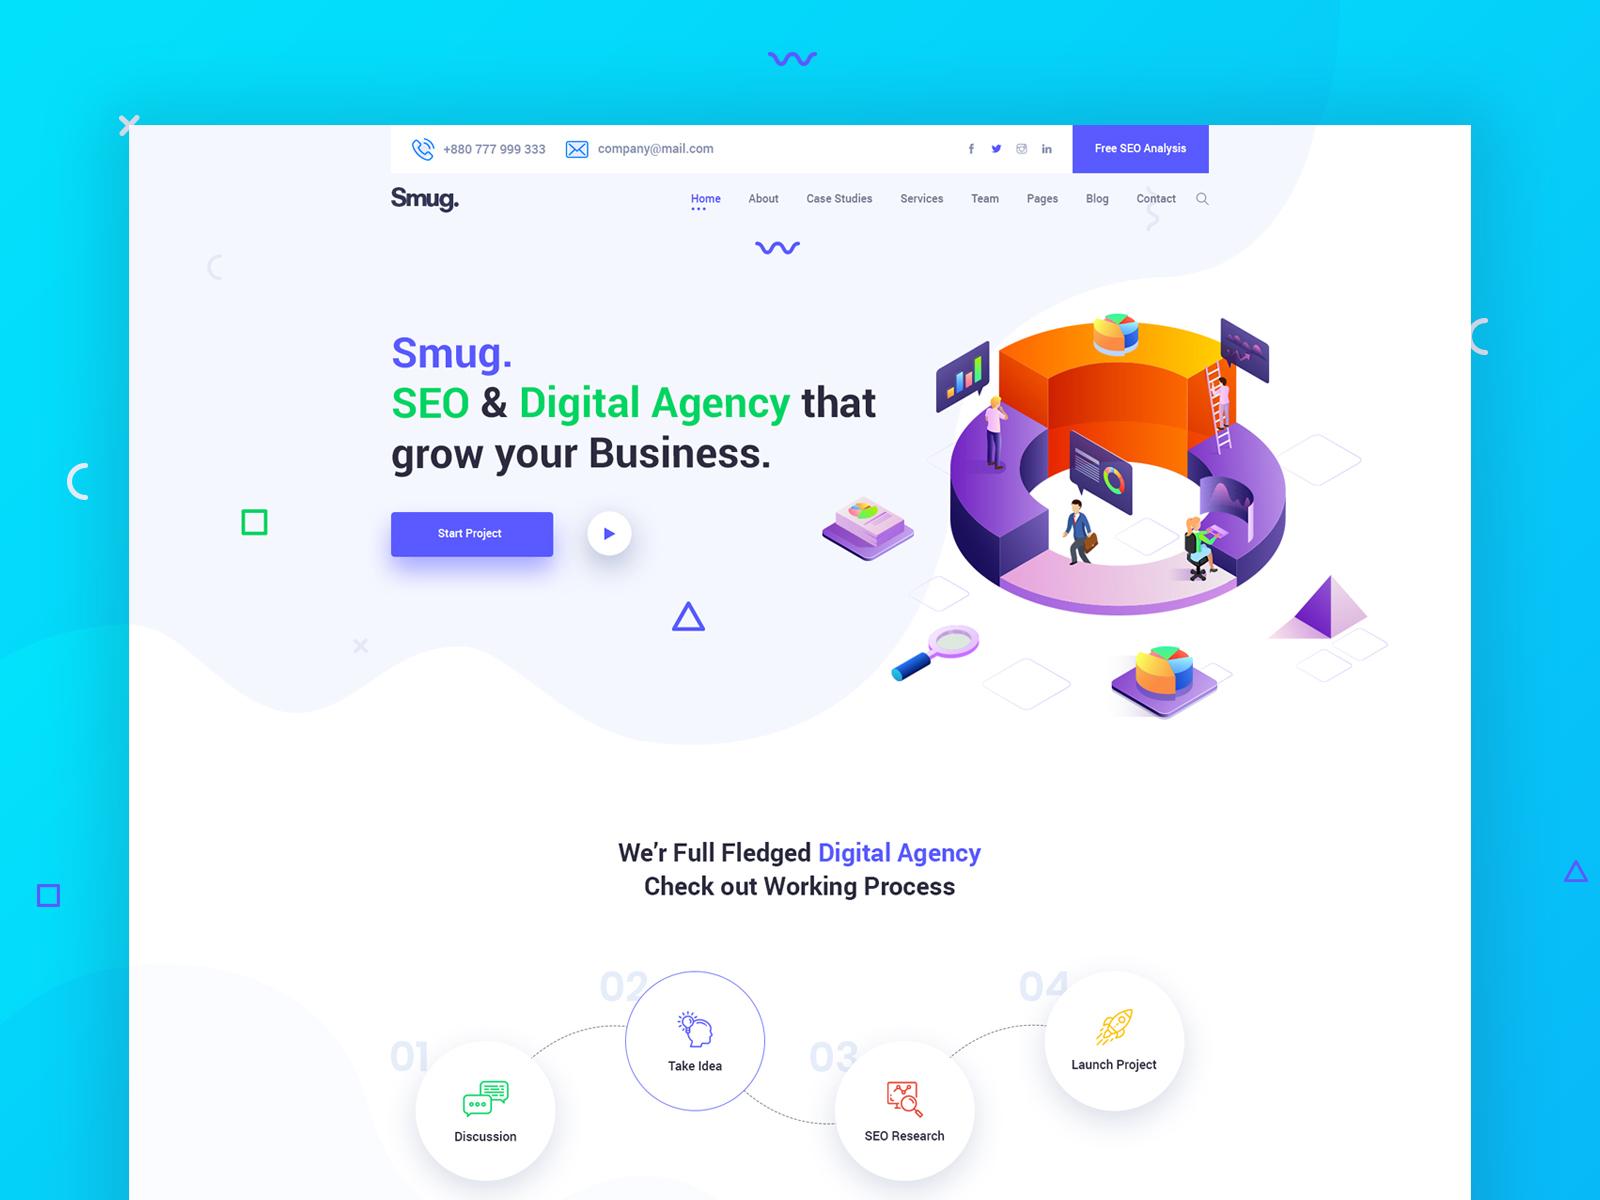 Smug seo and digital agency